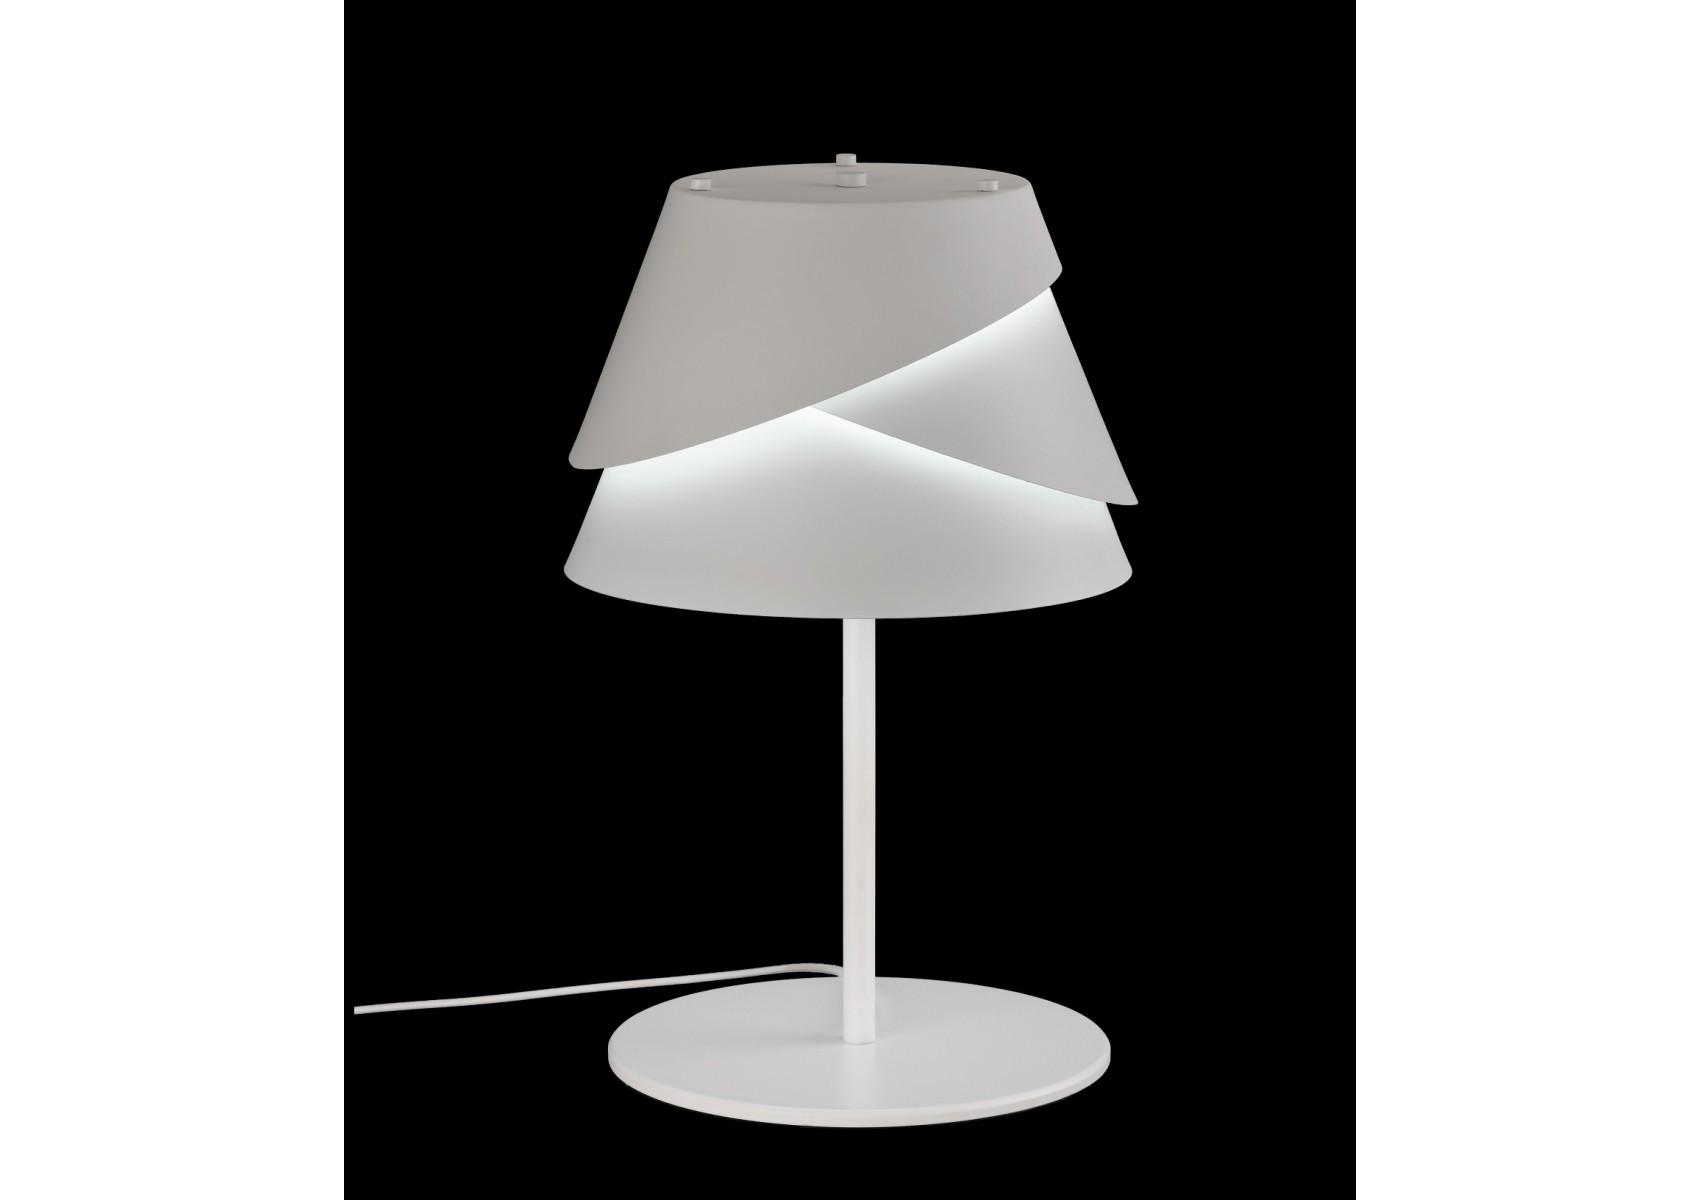 lampe de table moderne alboran en m tal de chez mantra. Black Bedroom Furniture Sets. Home Design Ideas